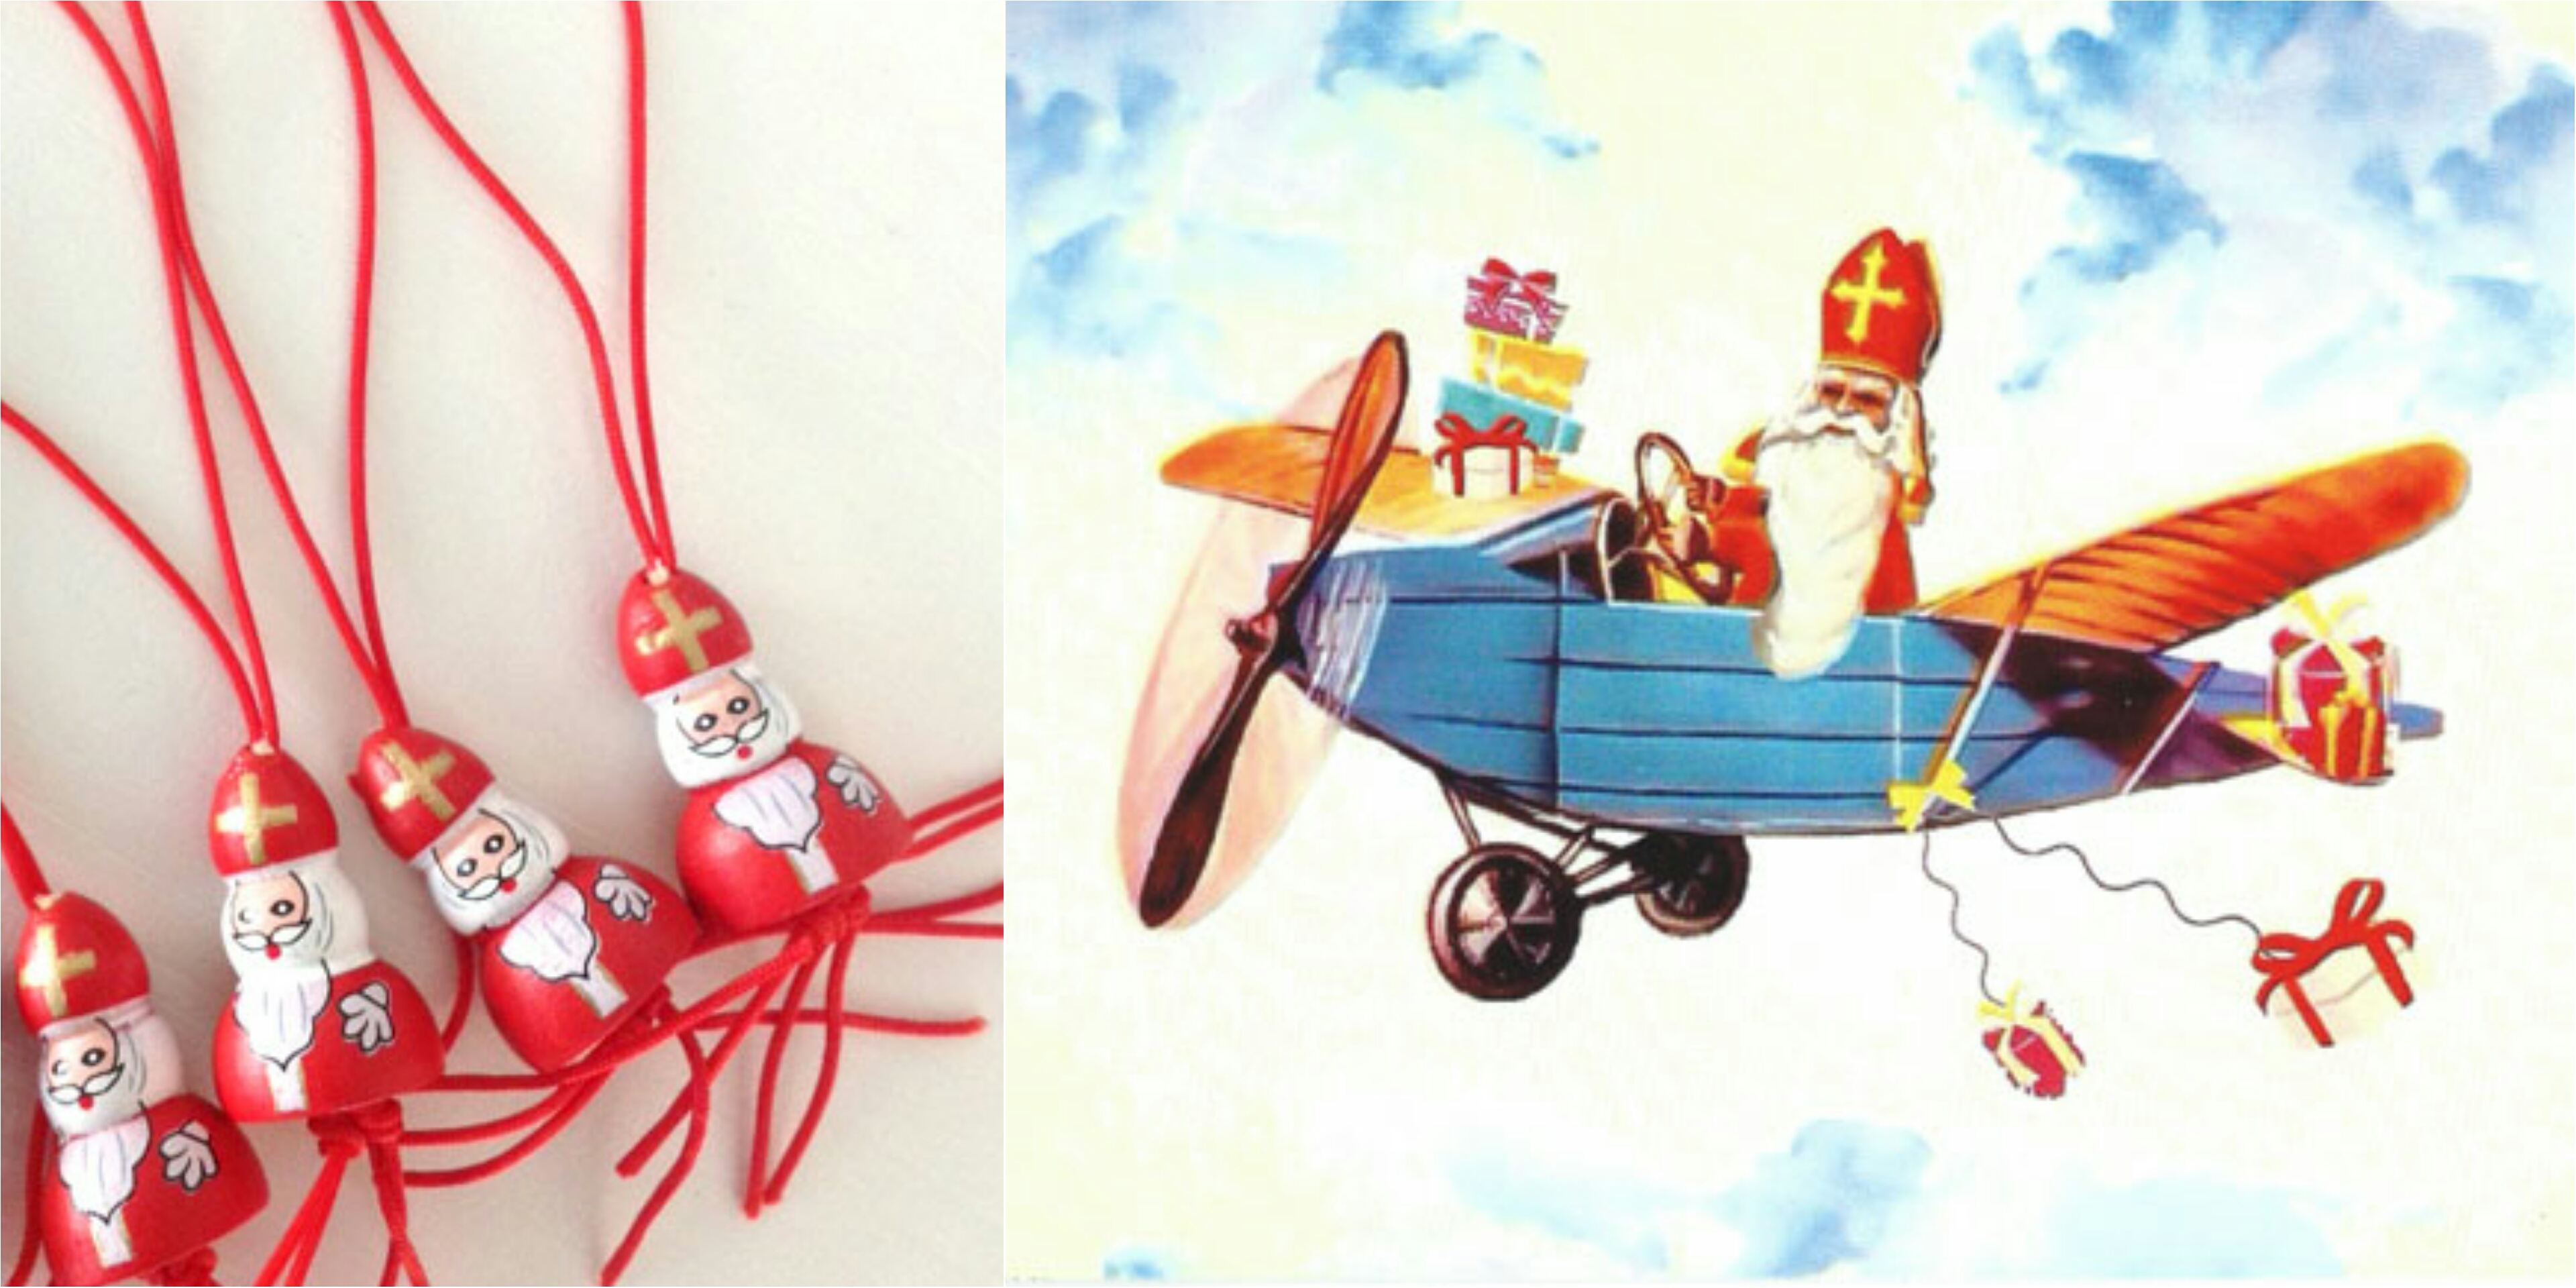 Leuke Sinterklaasproducten van PapierDier